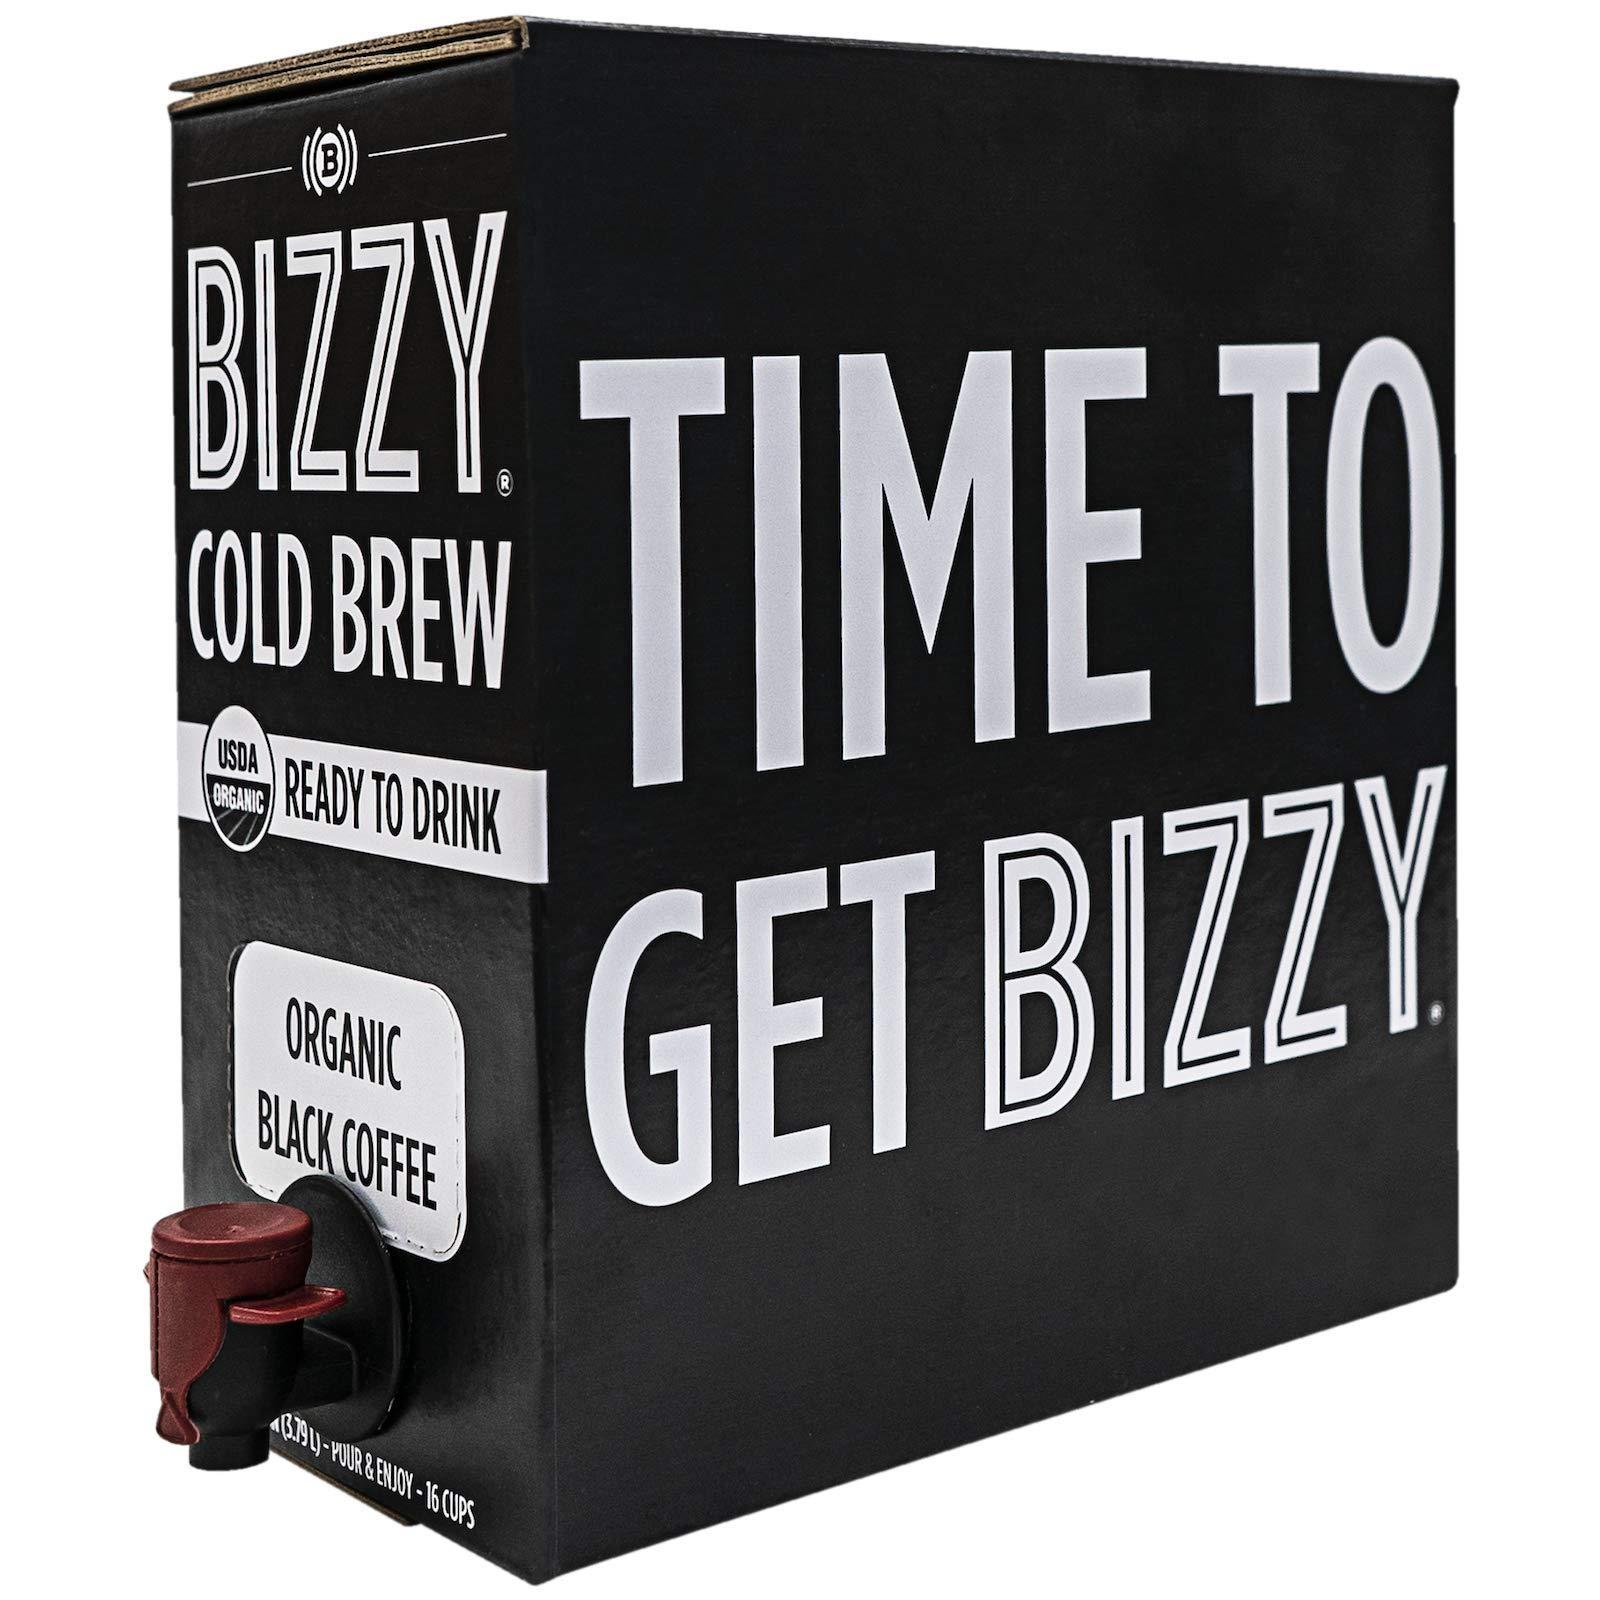 Bizzy Organic Cold Brew Coffee - Ready-to-Drink - 128 fl oz Bag-in-box - Coffee on Tap